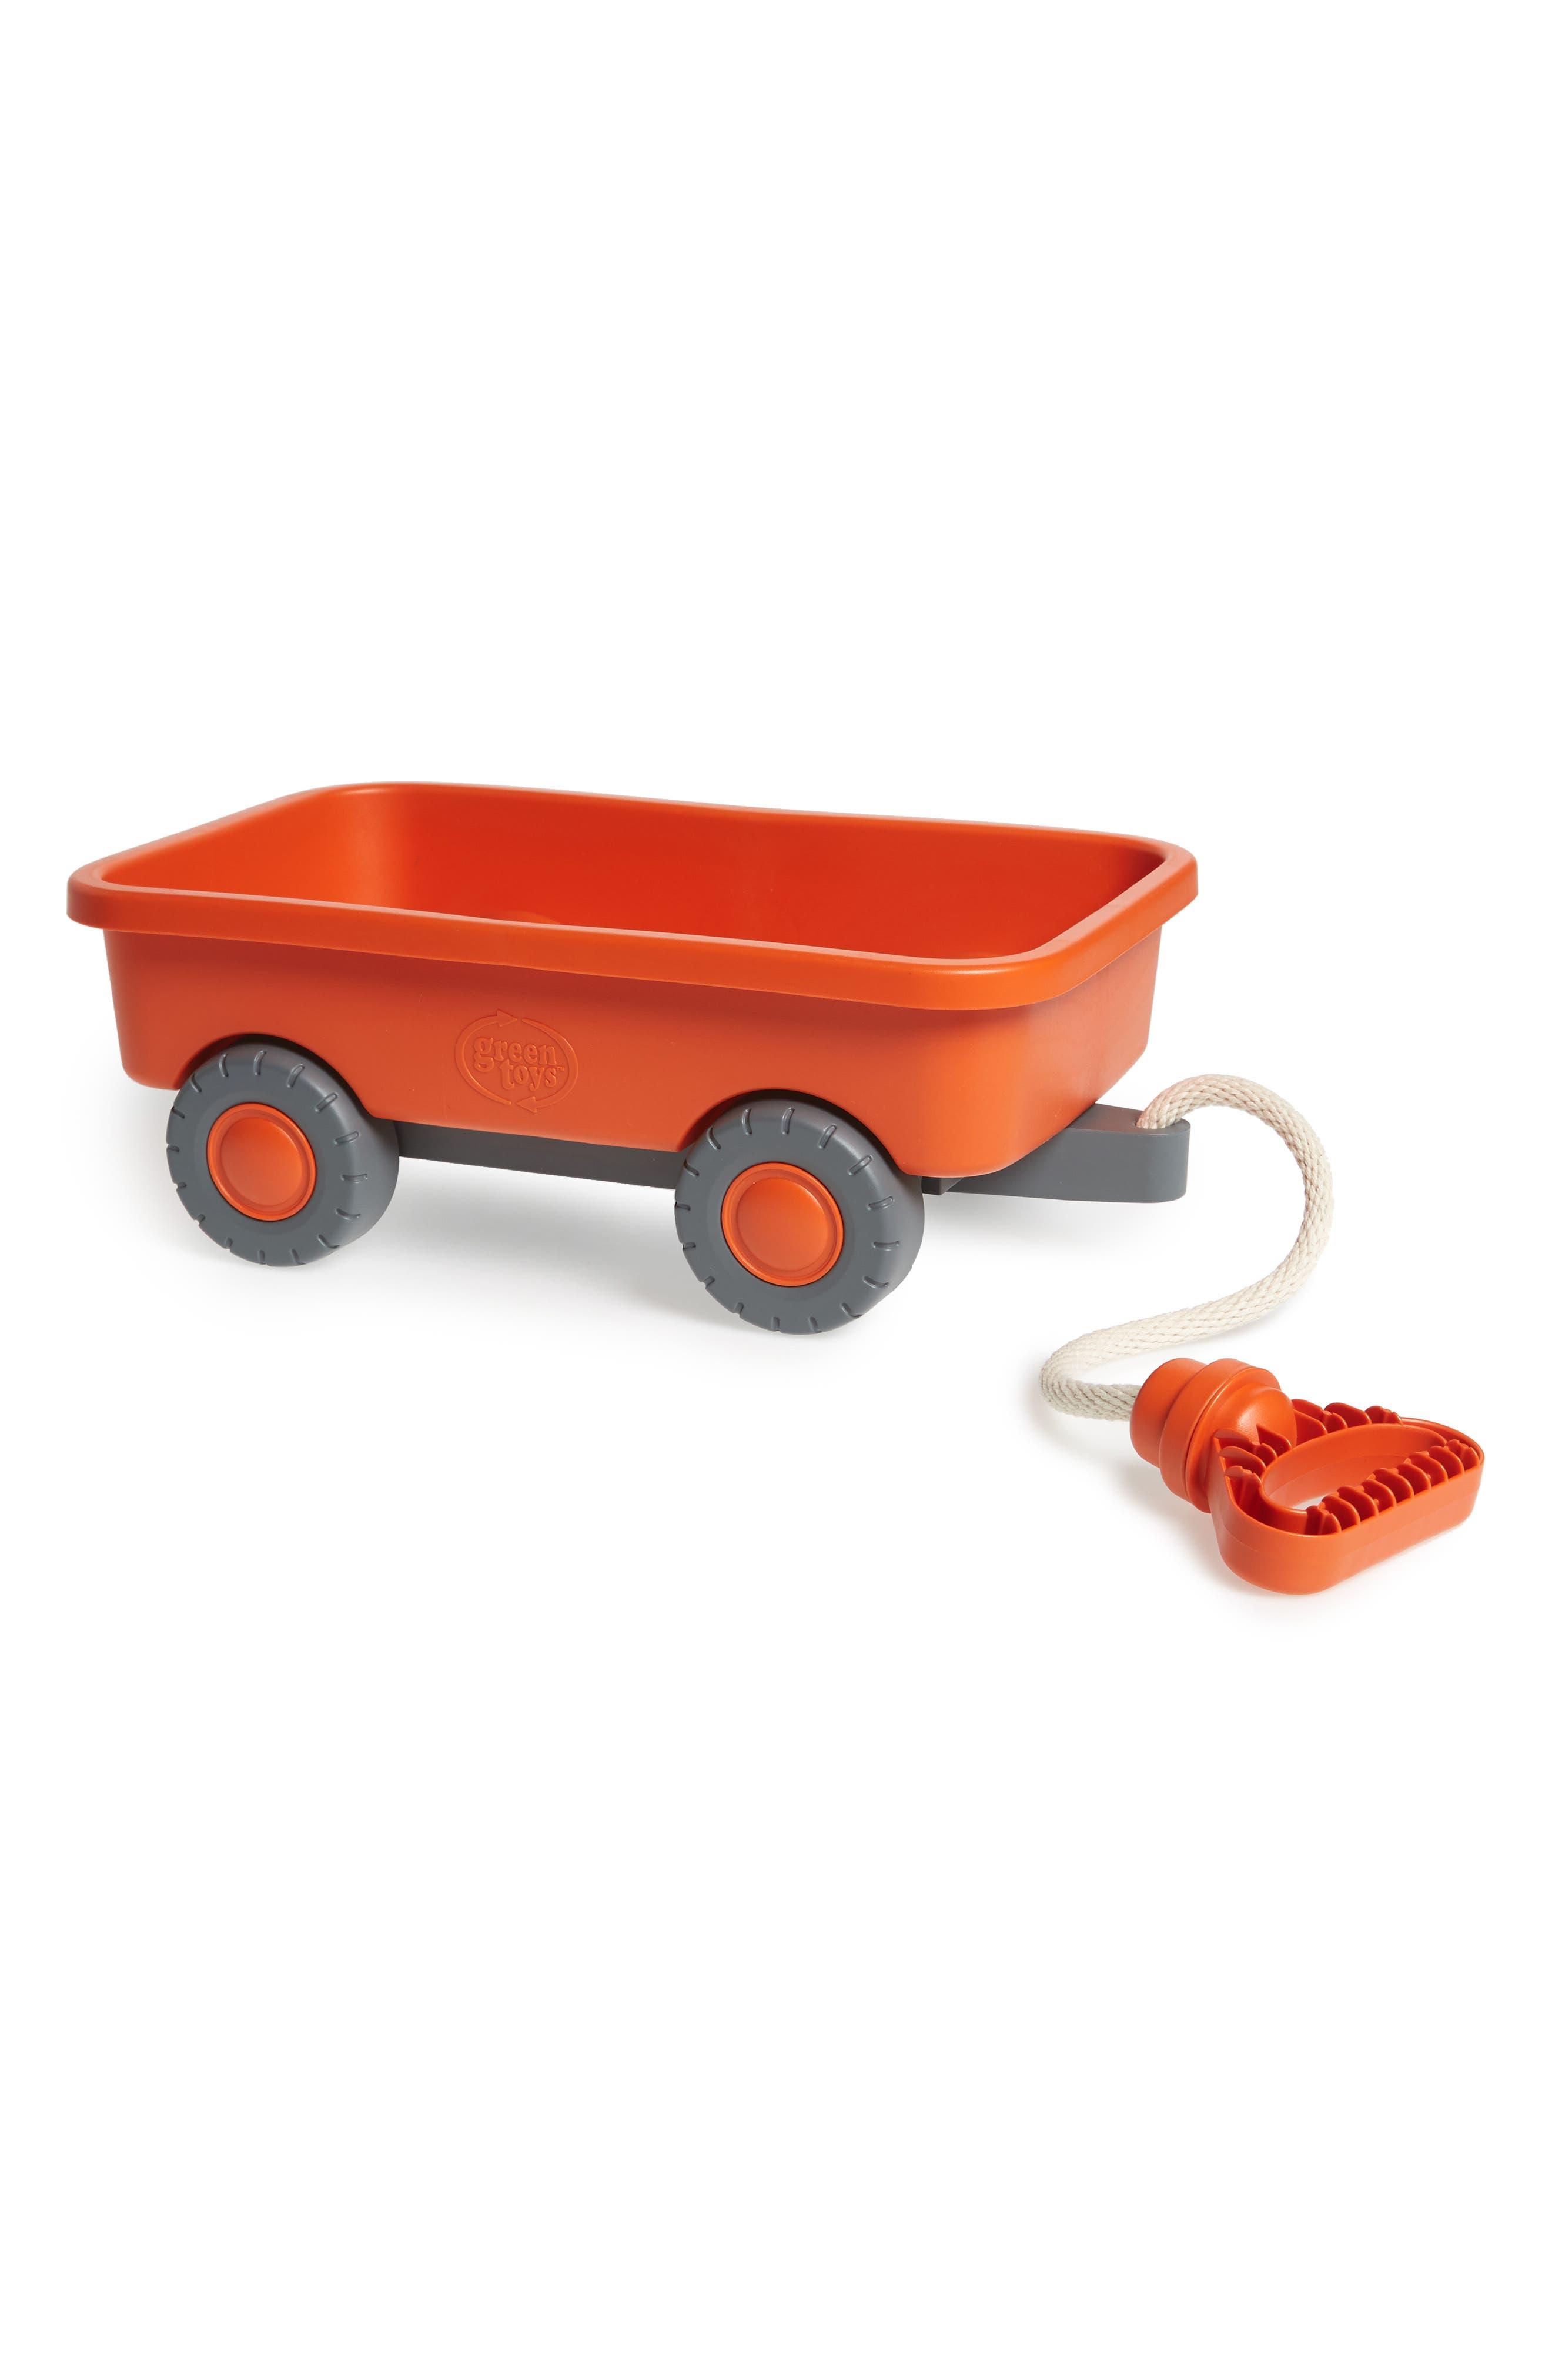 Orange Recycled Plastic Wagon,                             Main thumbnail 1, color,                             800